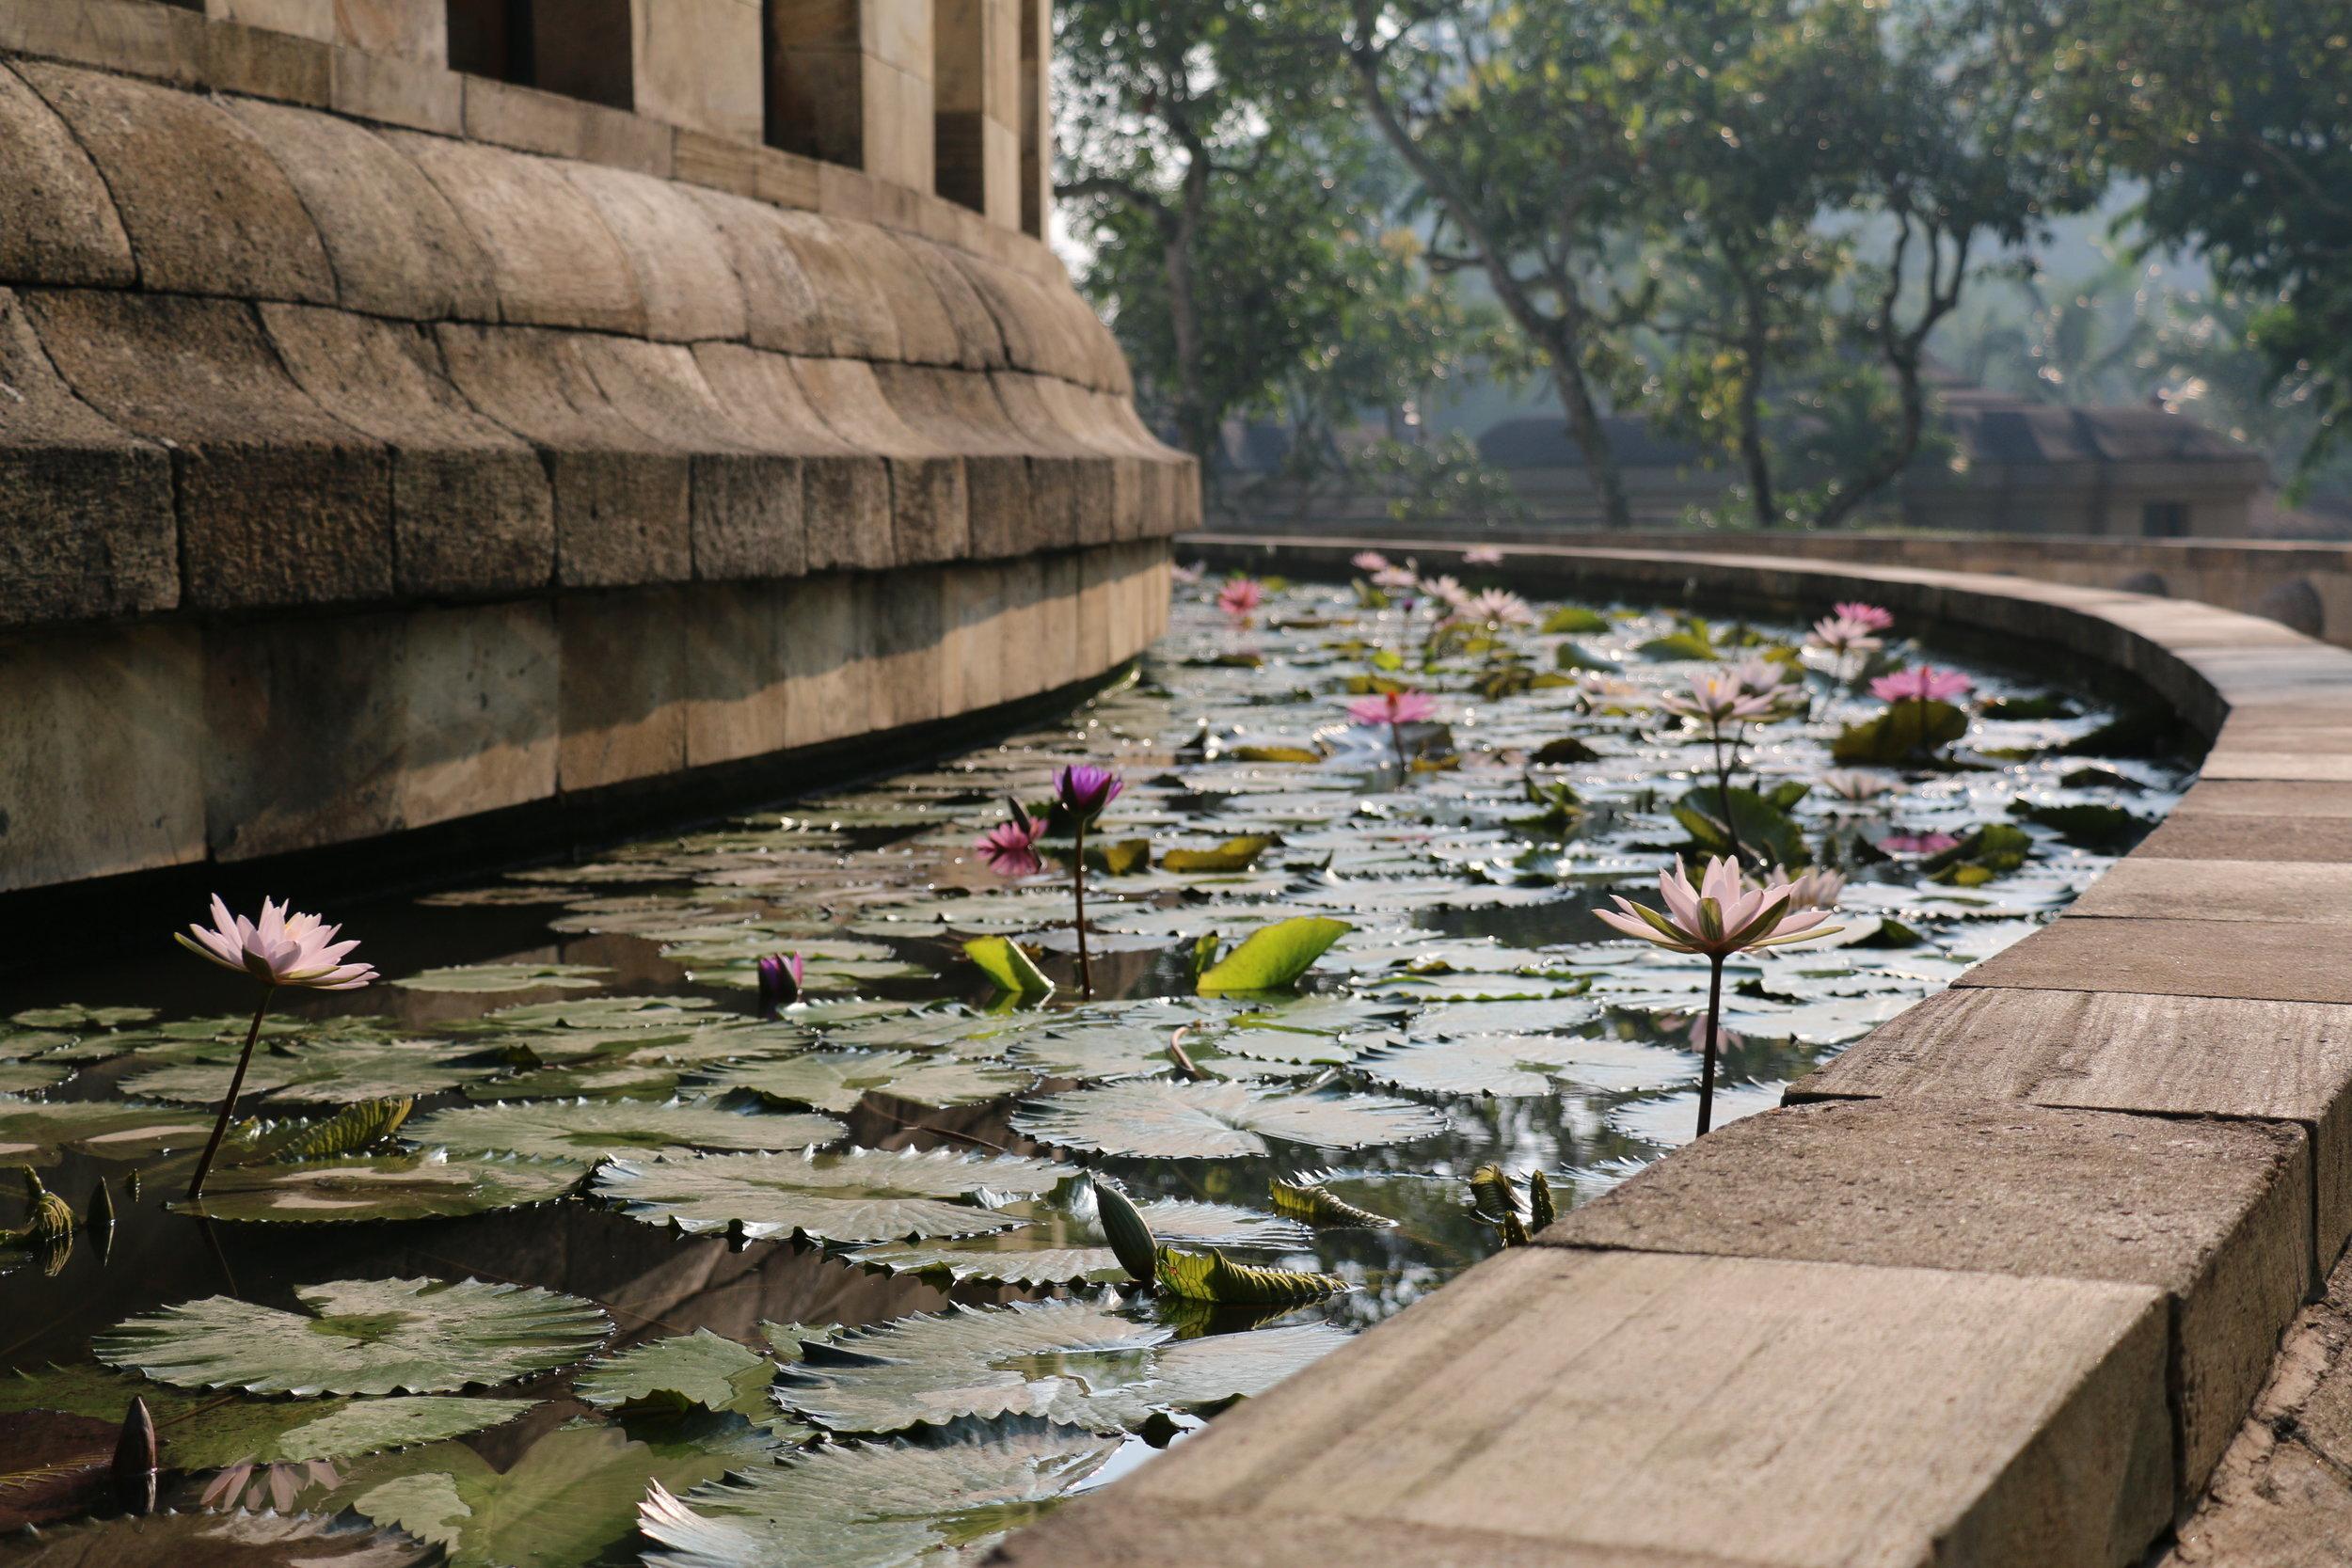 Lily ponds surround the main rotunda